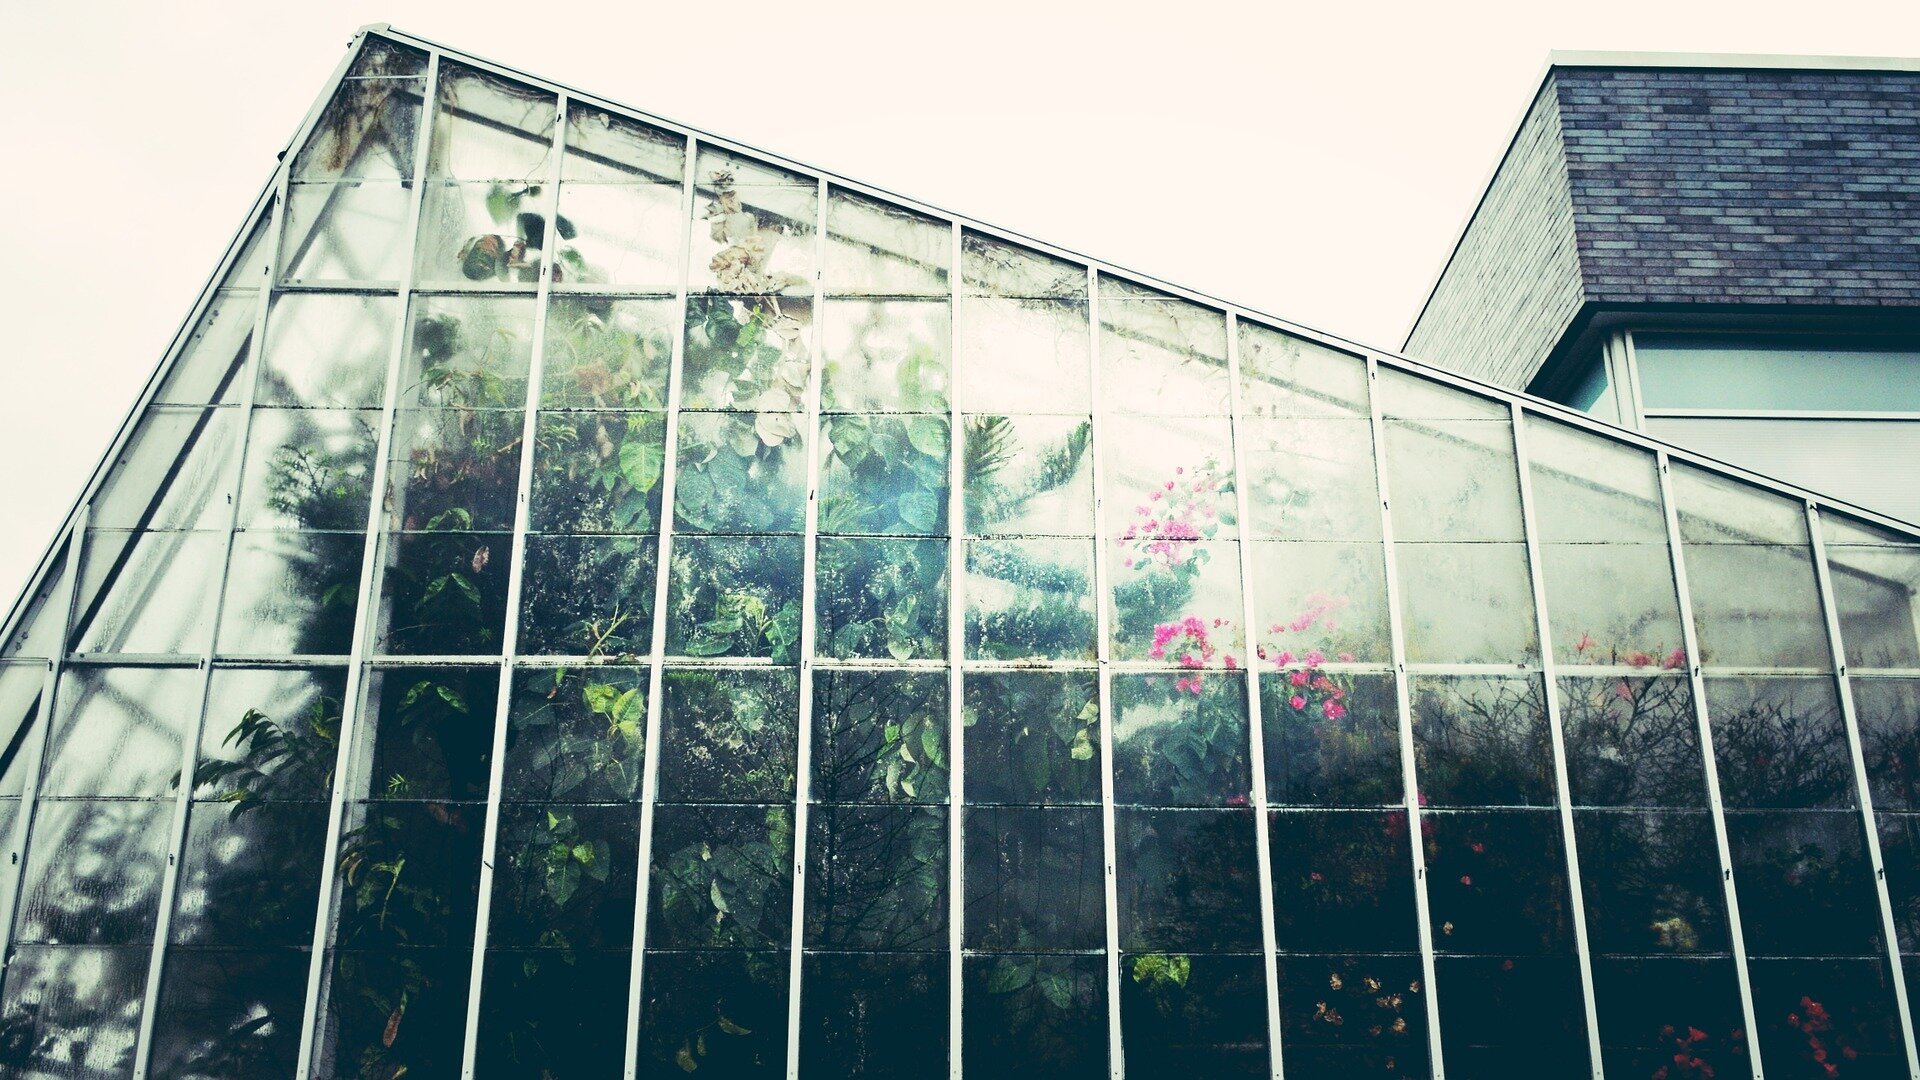 greenhouse-1246536_1920.jpg